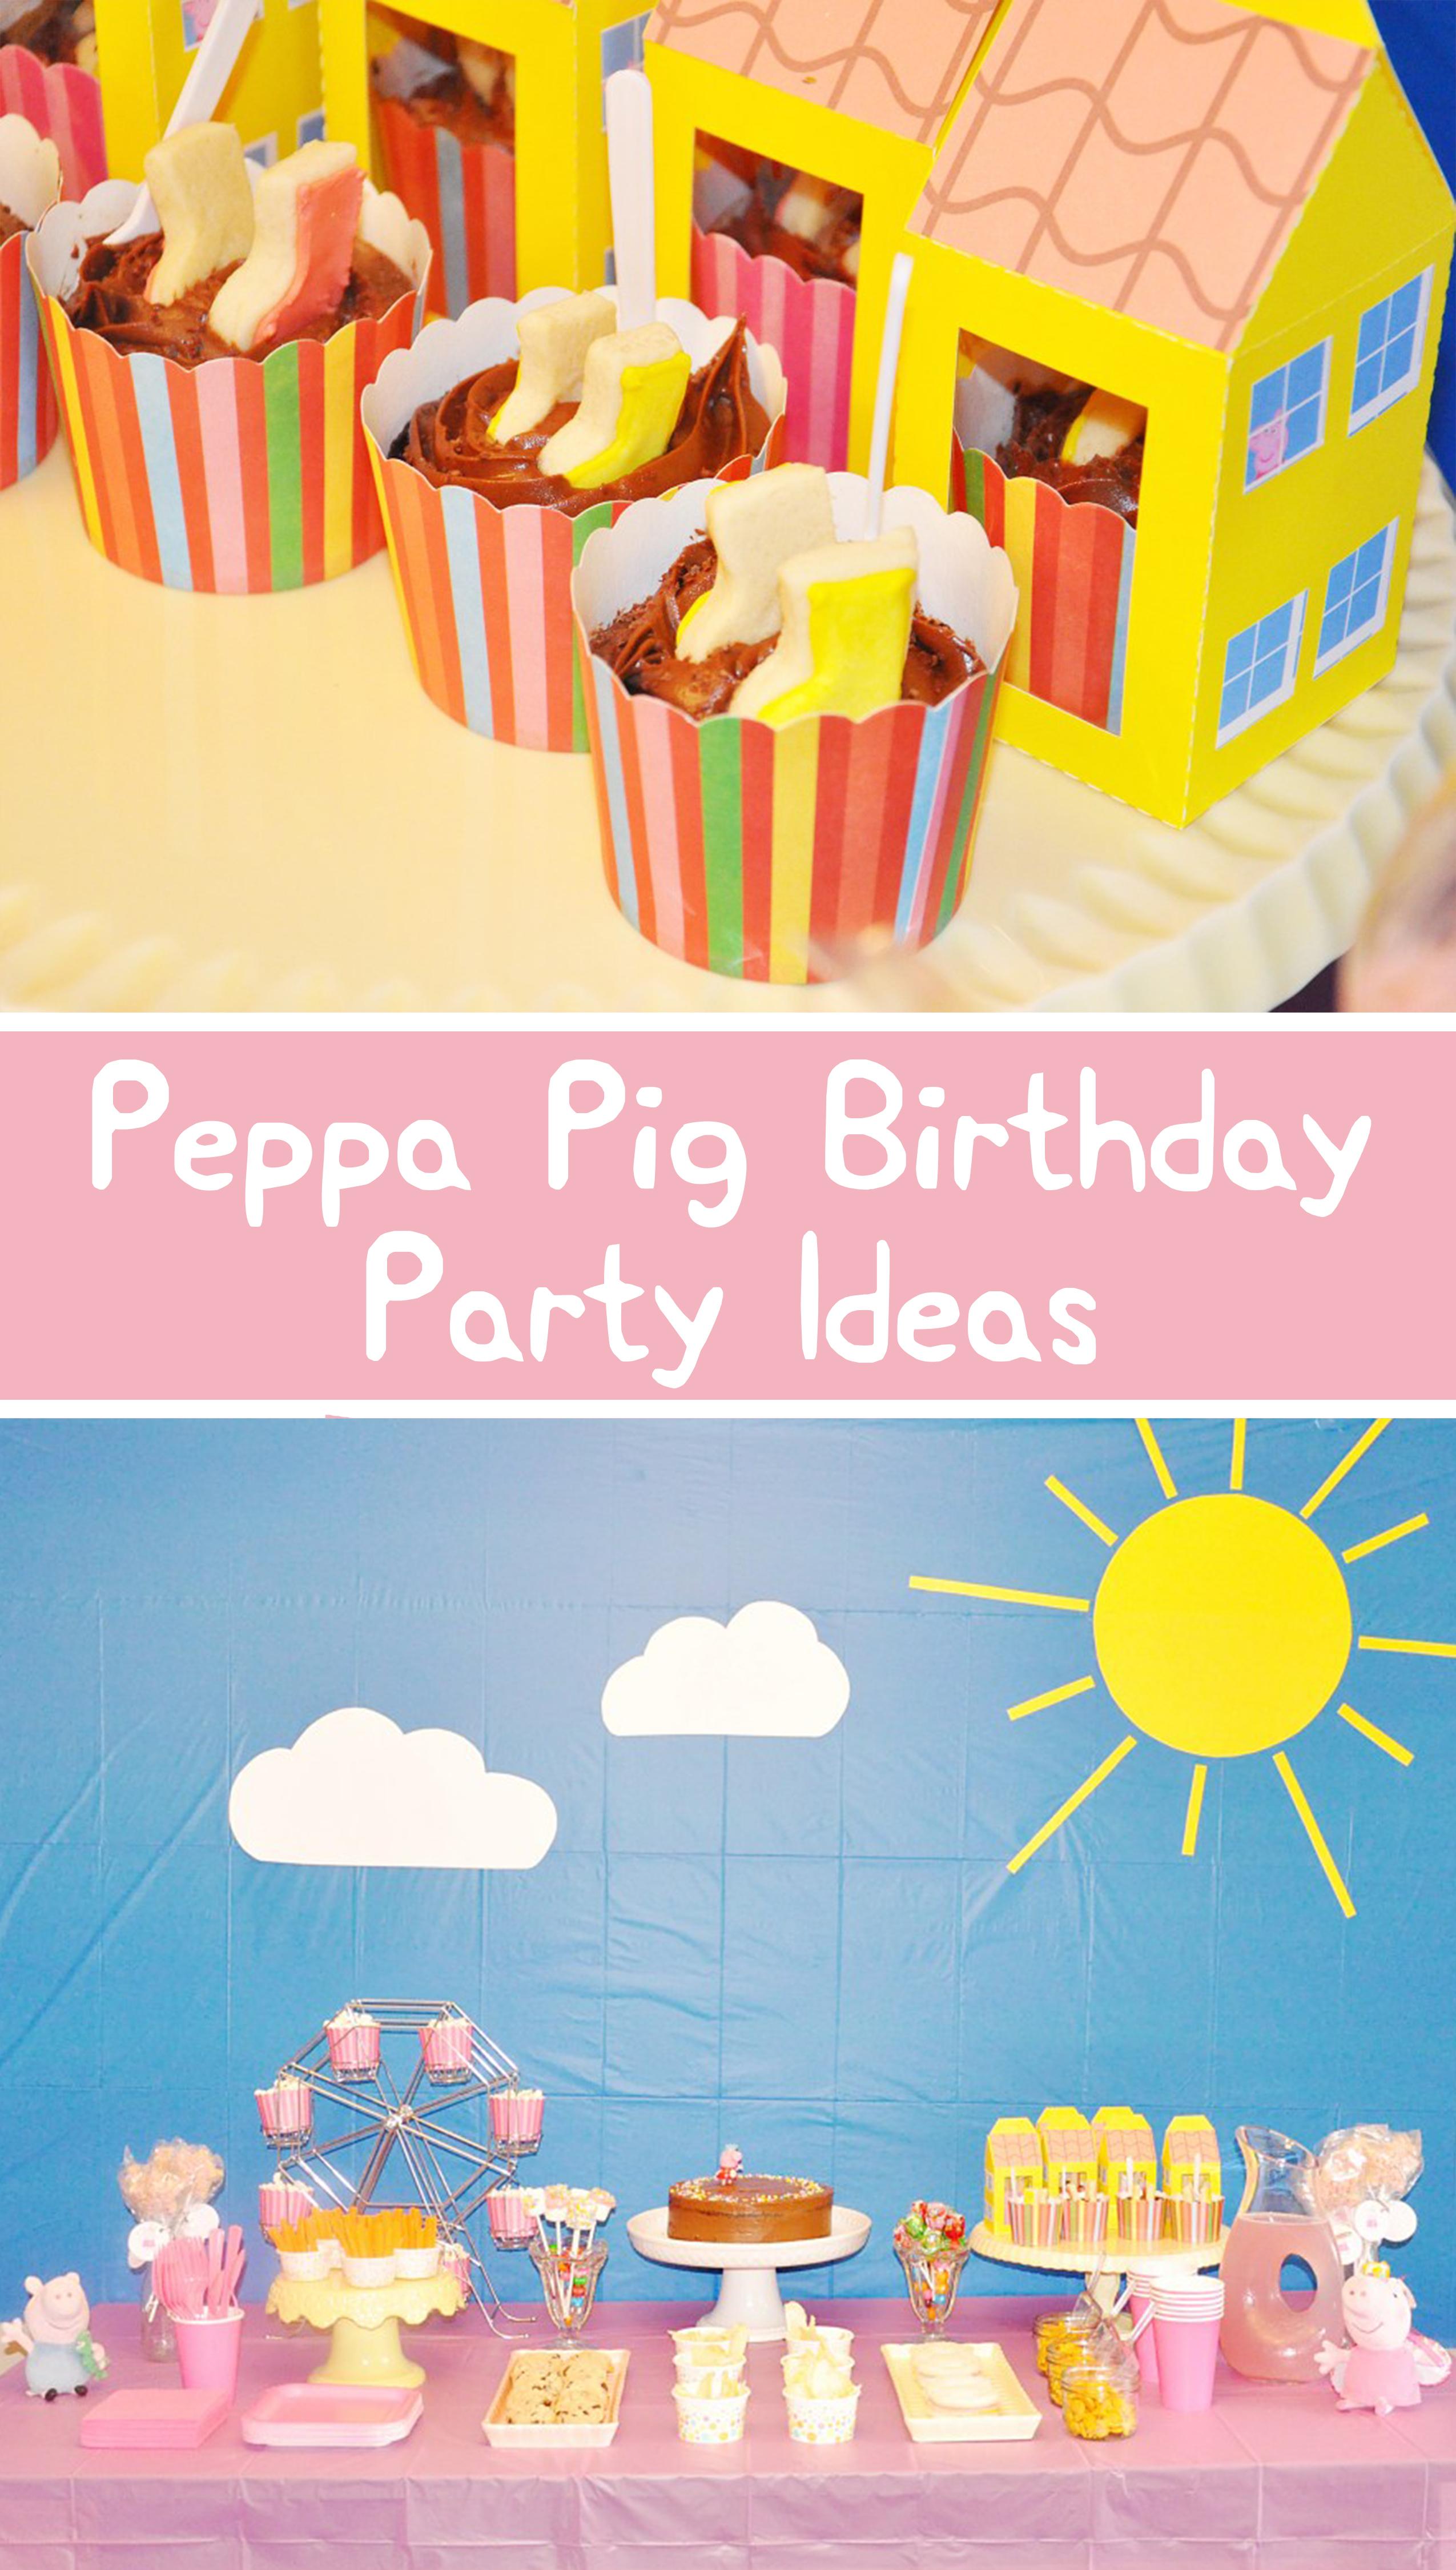 Peppa Pig Birthday Party! (Simple Diy Ideas & Free Printables - Peppa Pig Birthday Banner Printable Free